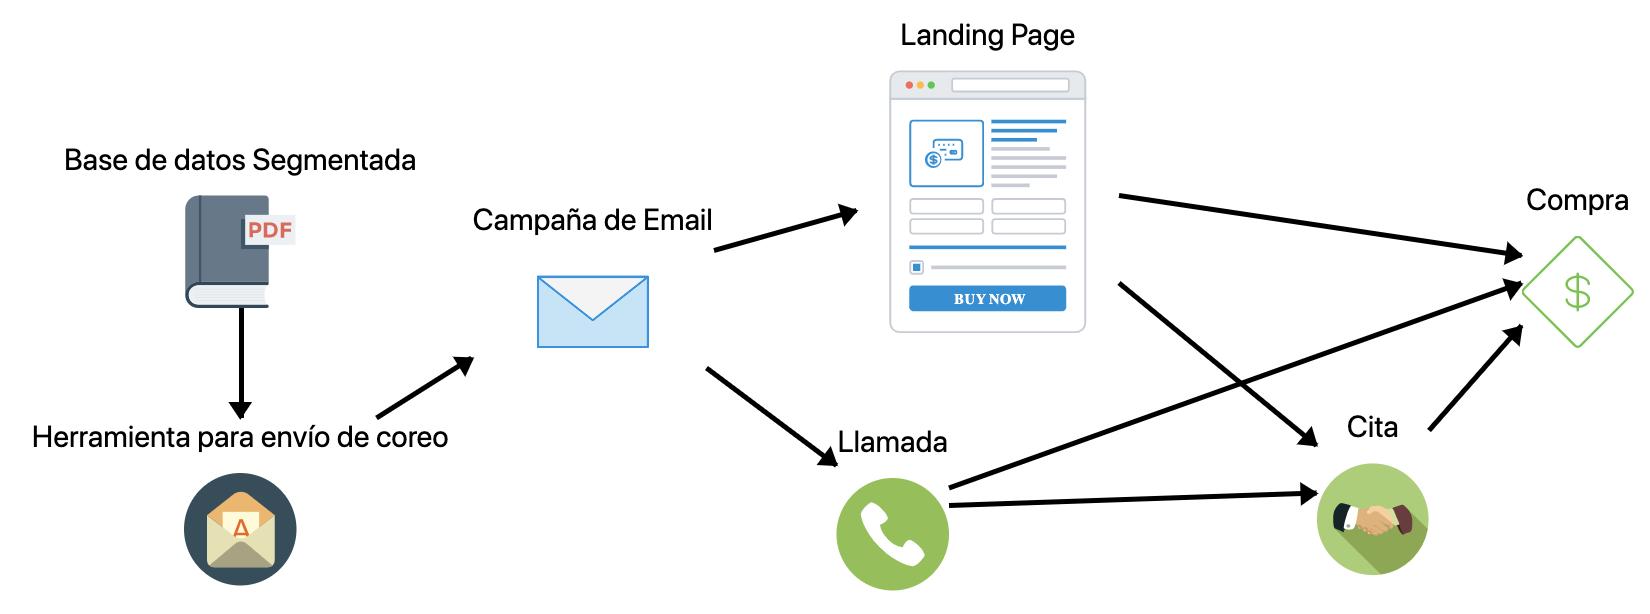 Funnel de leads para email mkt metamedia